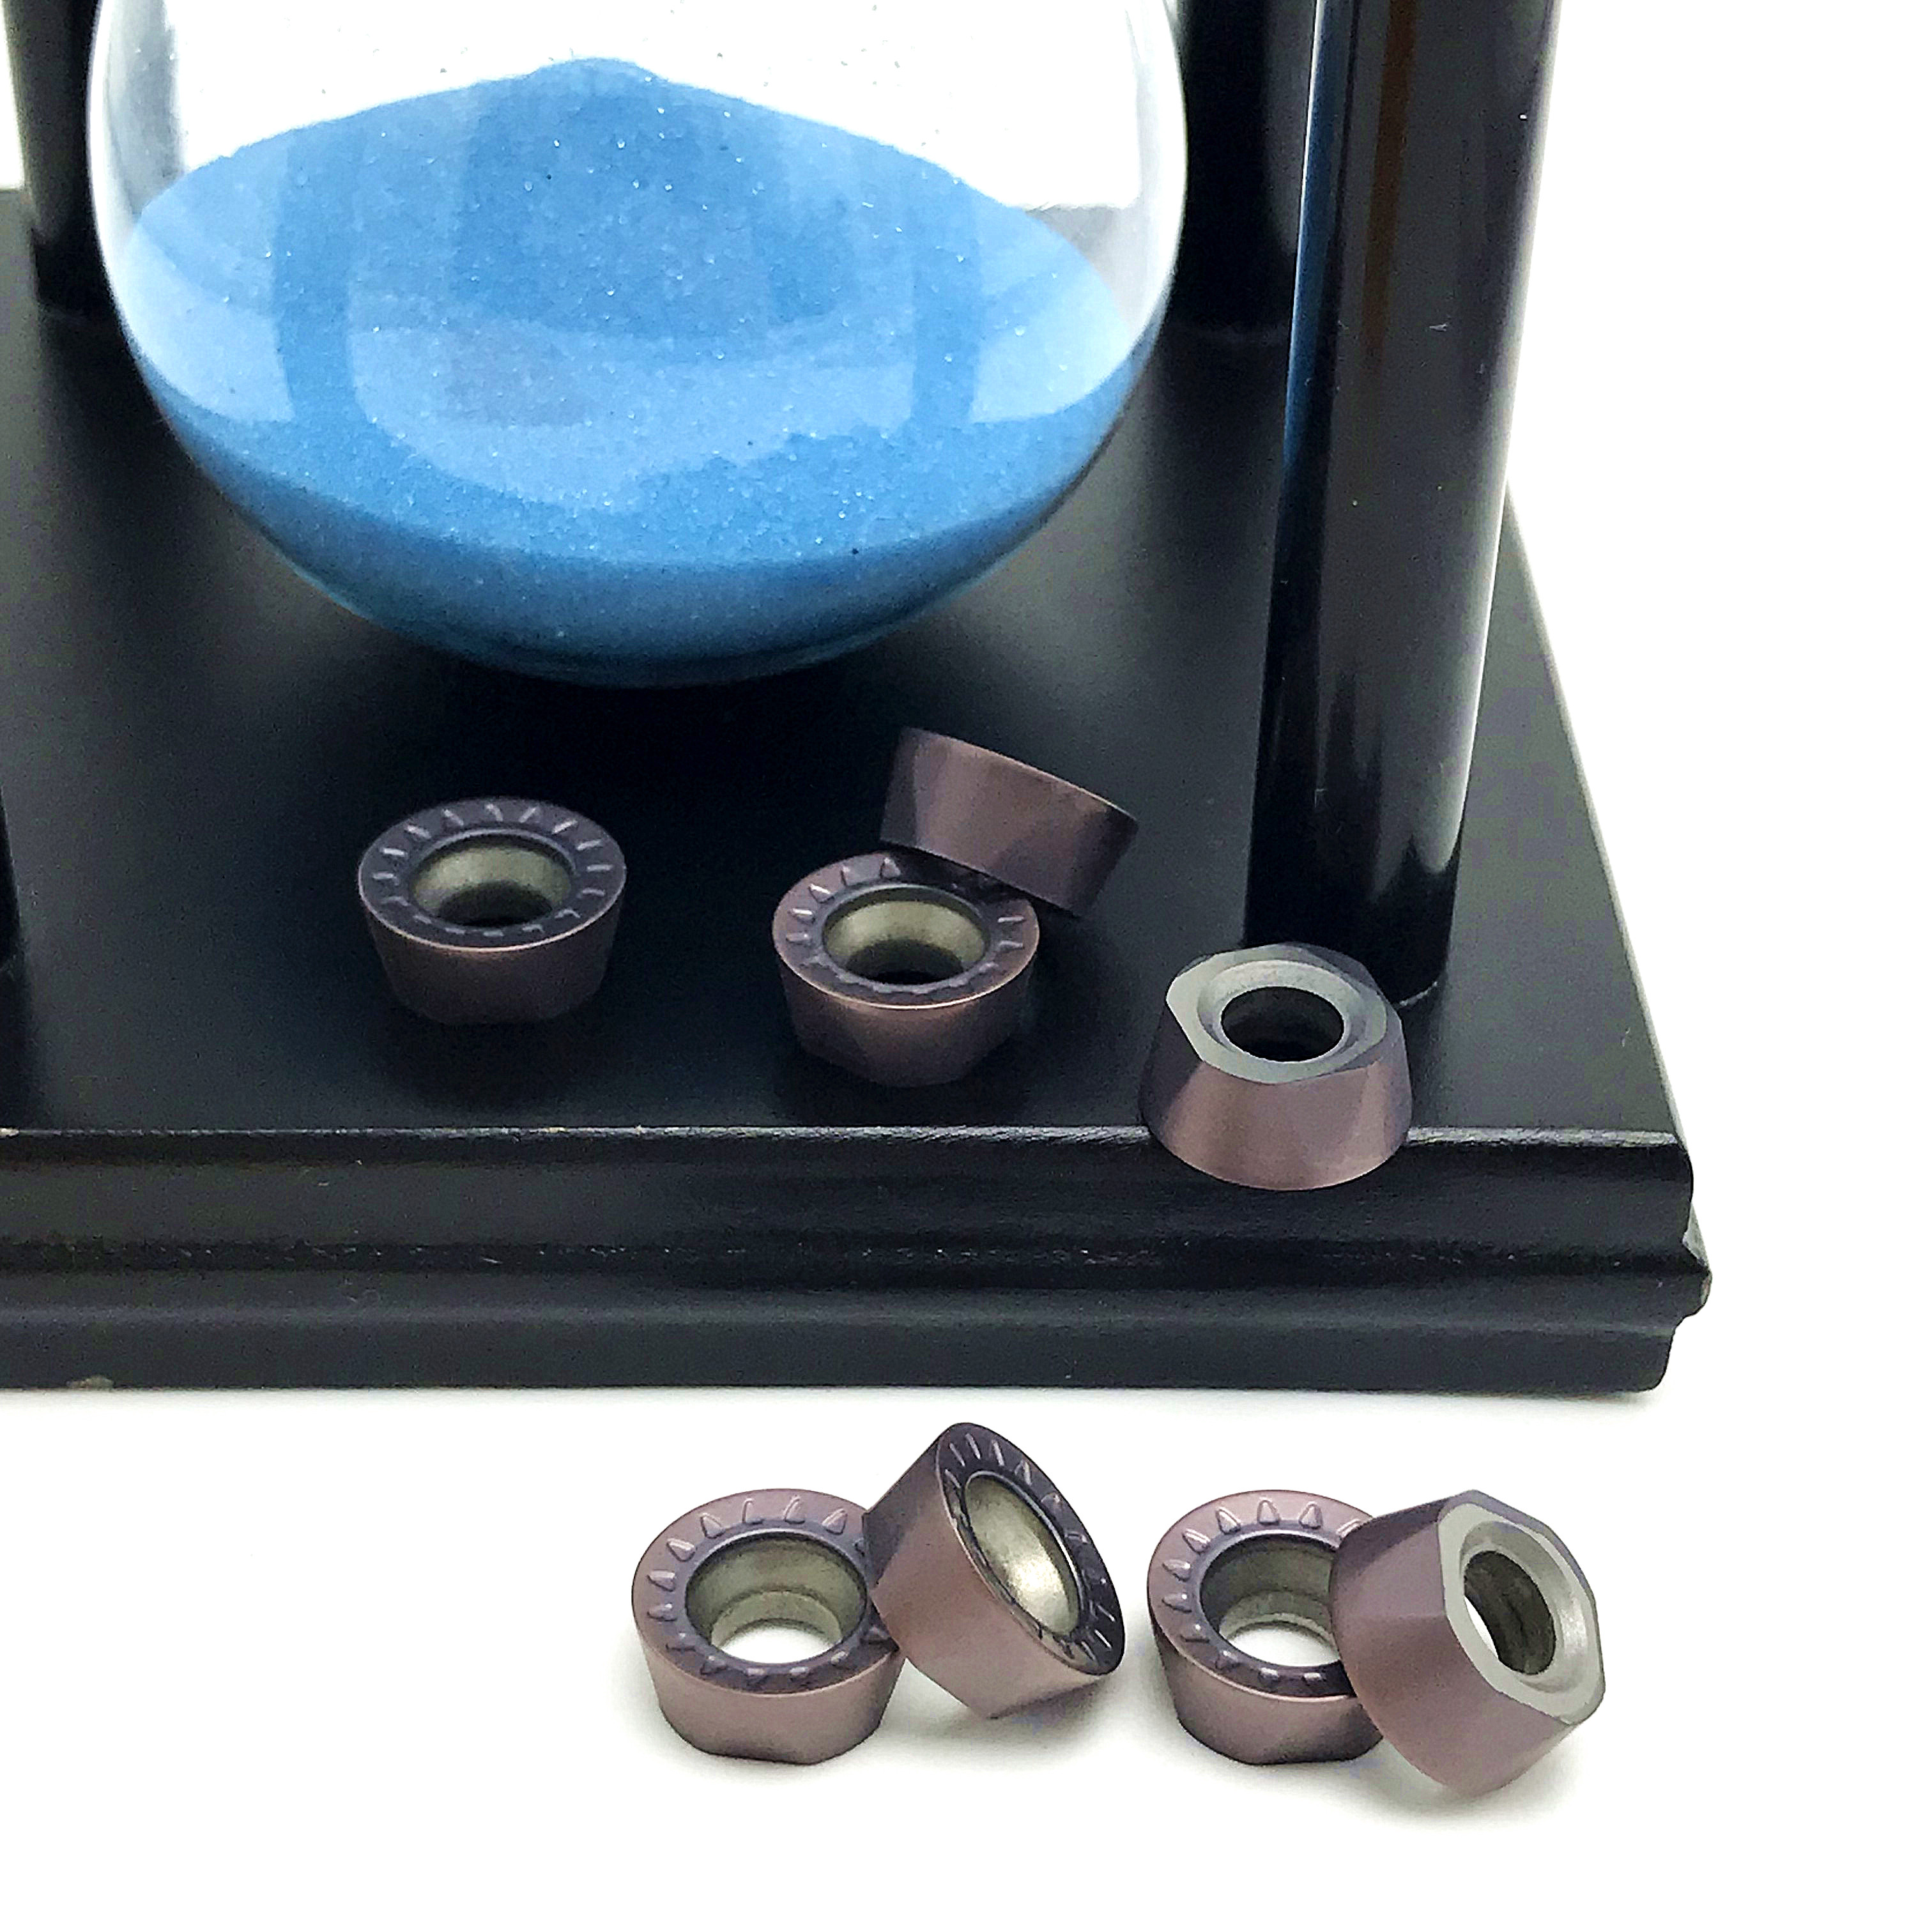 Milling Tools RPMW1003 RPMT10T3 RPMT1204 RPMT08T2 VP15TF Carbide Insert Lathe Tool Hard Alloy Milling Turning Tool